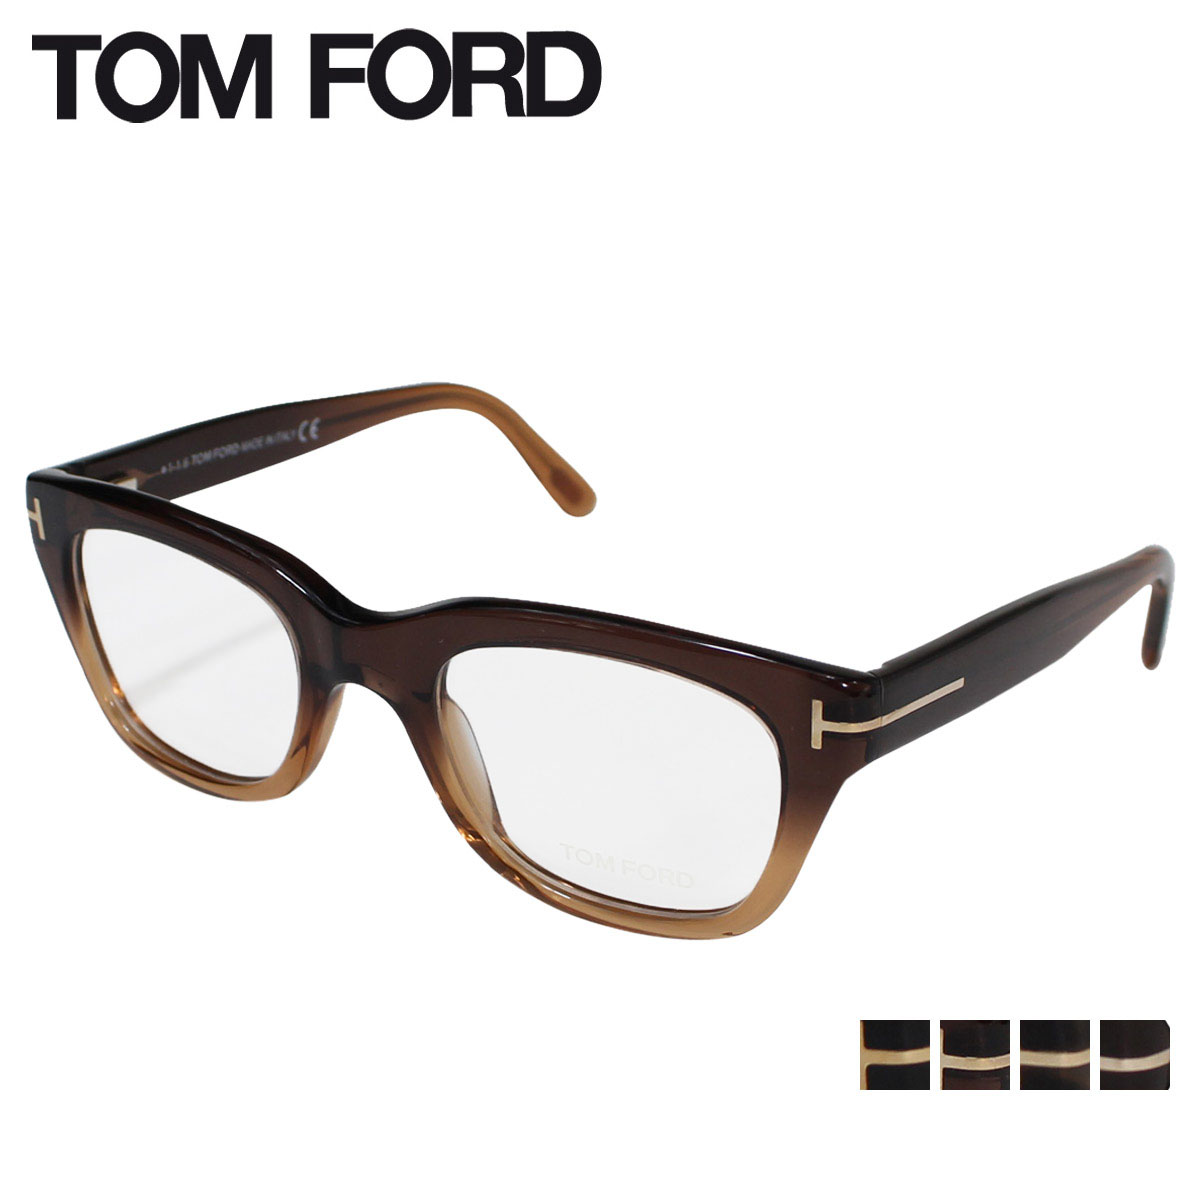 sugar online shop tom ford sunglasses mens womens tom ford eyewear acetate frames ft5178 italy. Black Bedroom Furniture Sets. Home Design Ideas